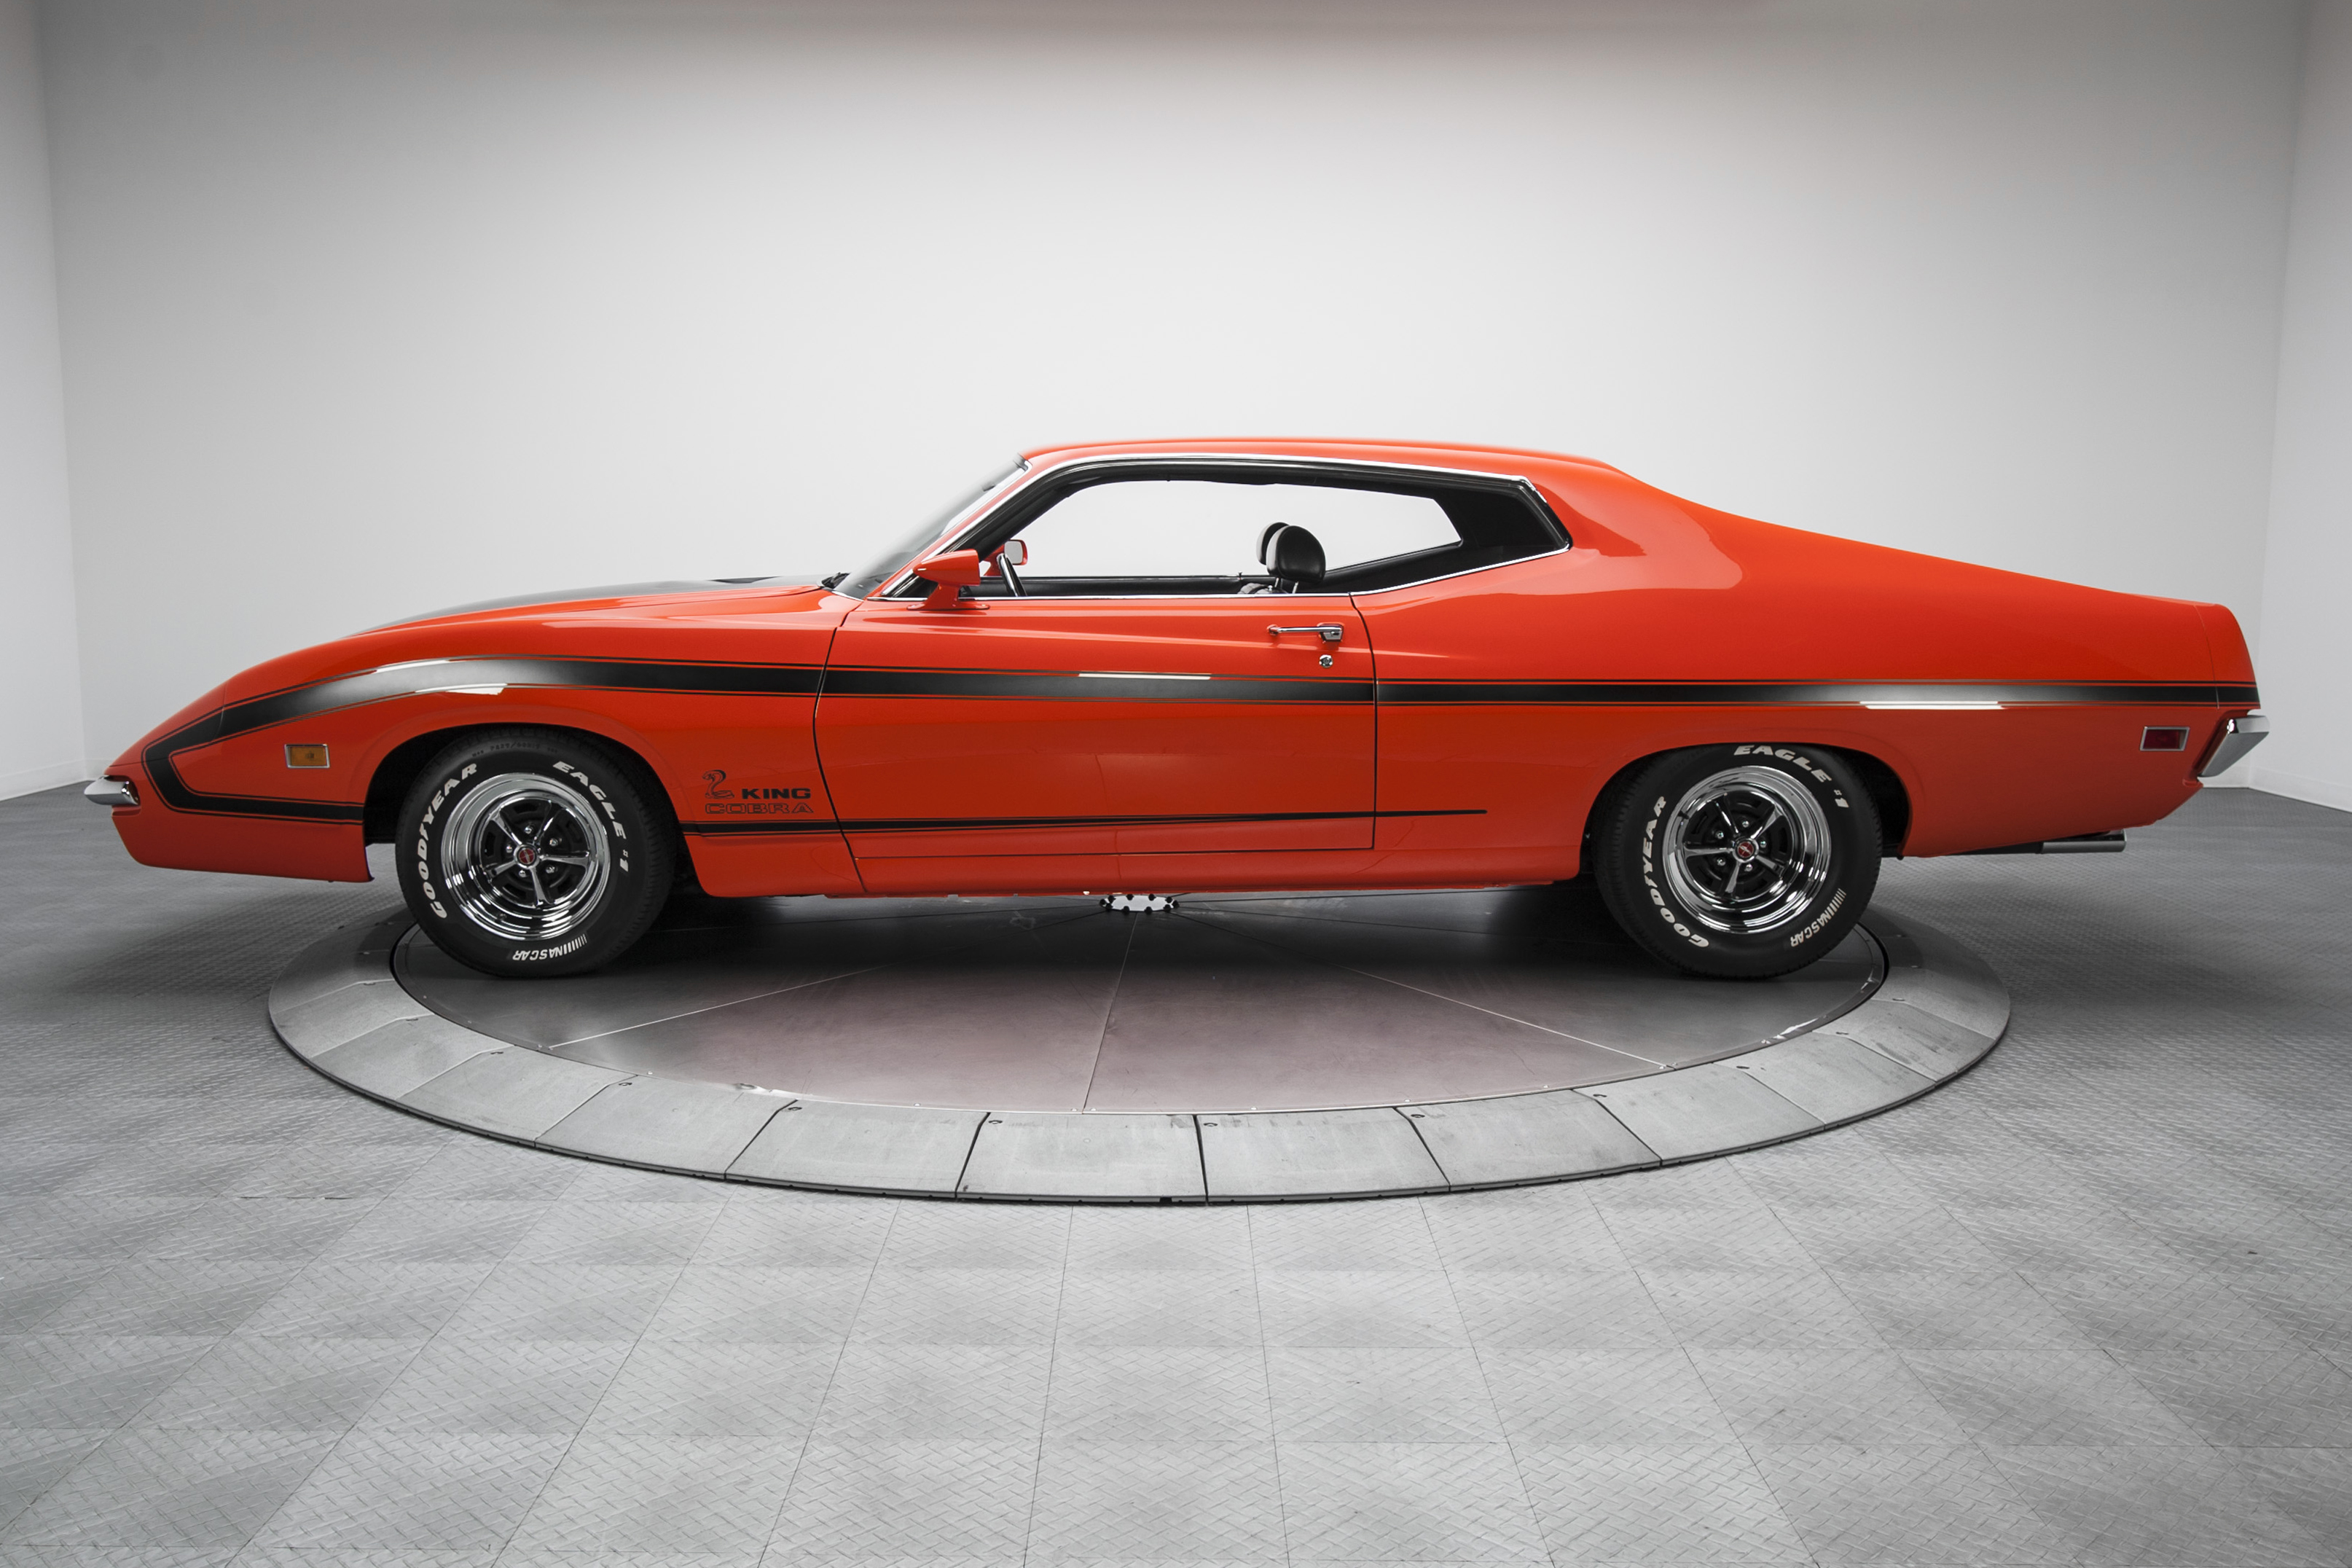 Ford Torino King Cobra profile